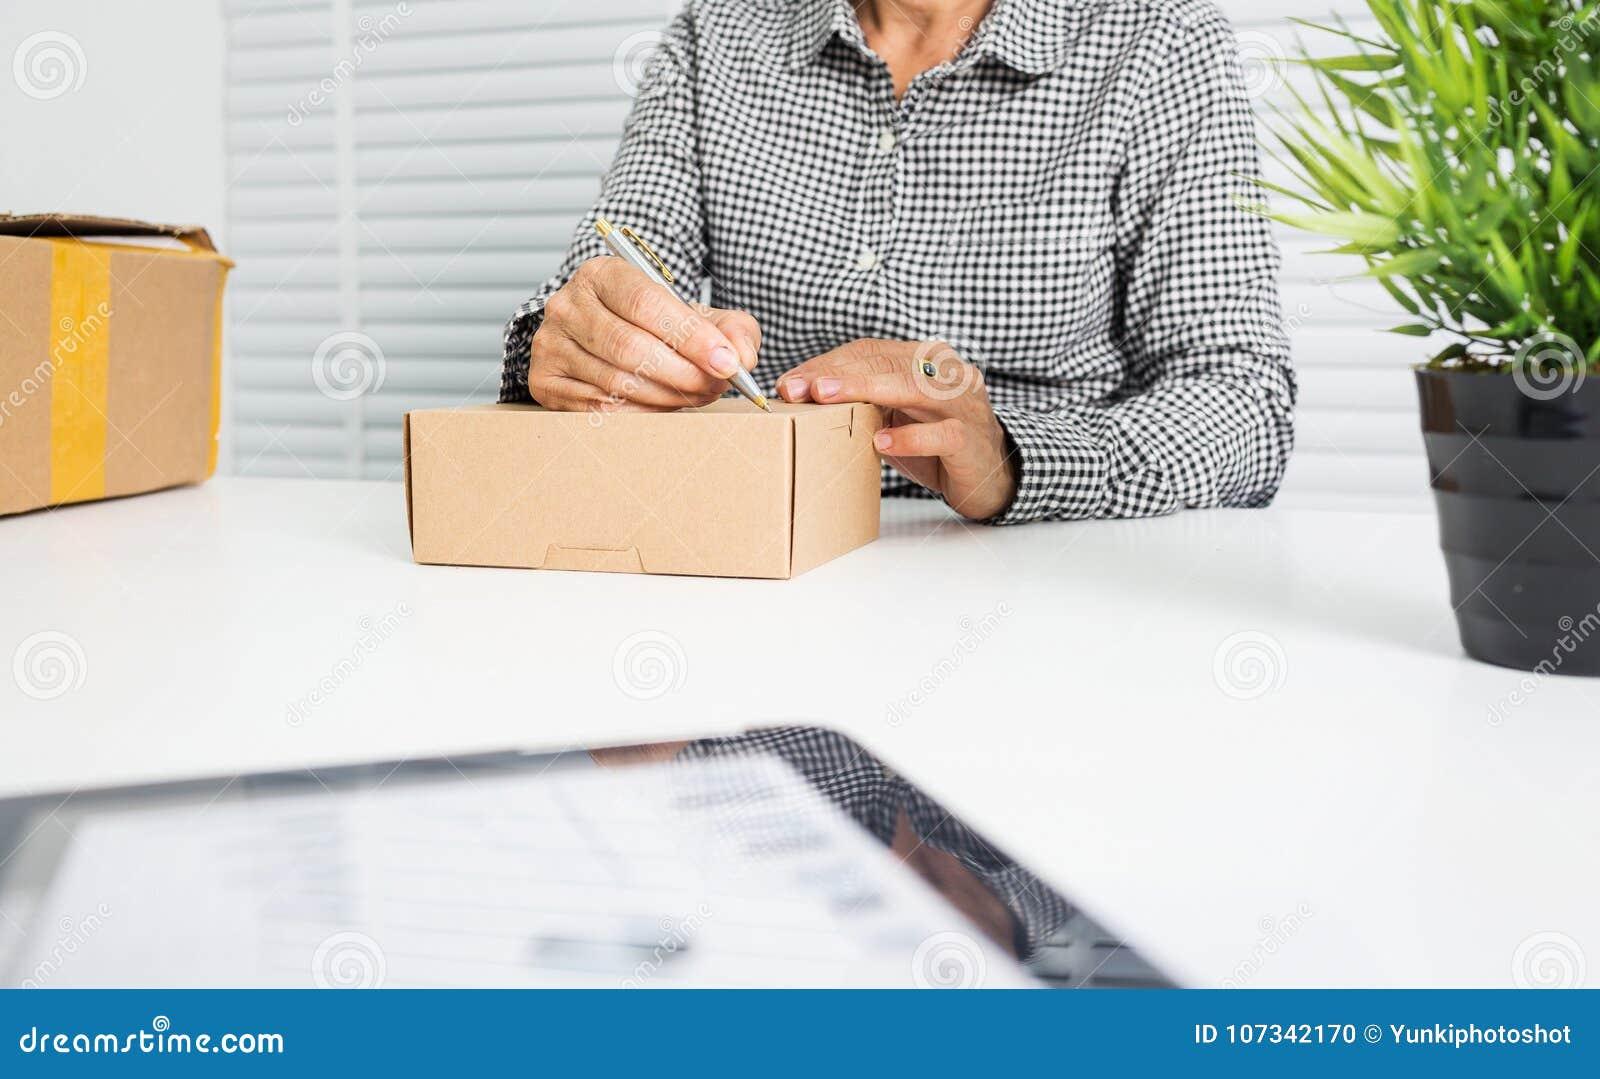 Азиатская бизнес-леди с коробкой пакета